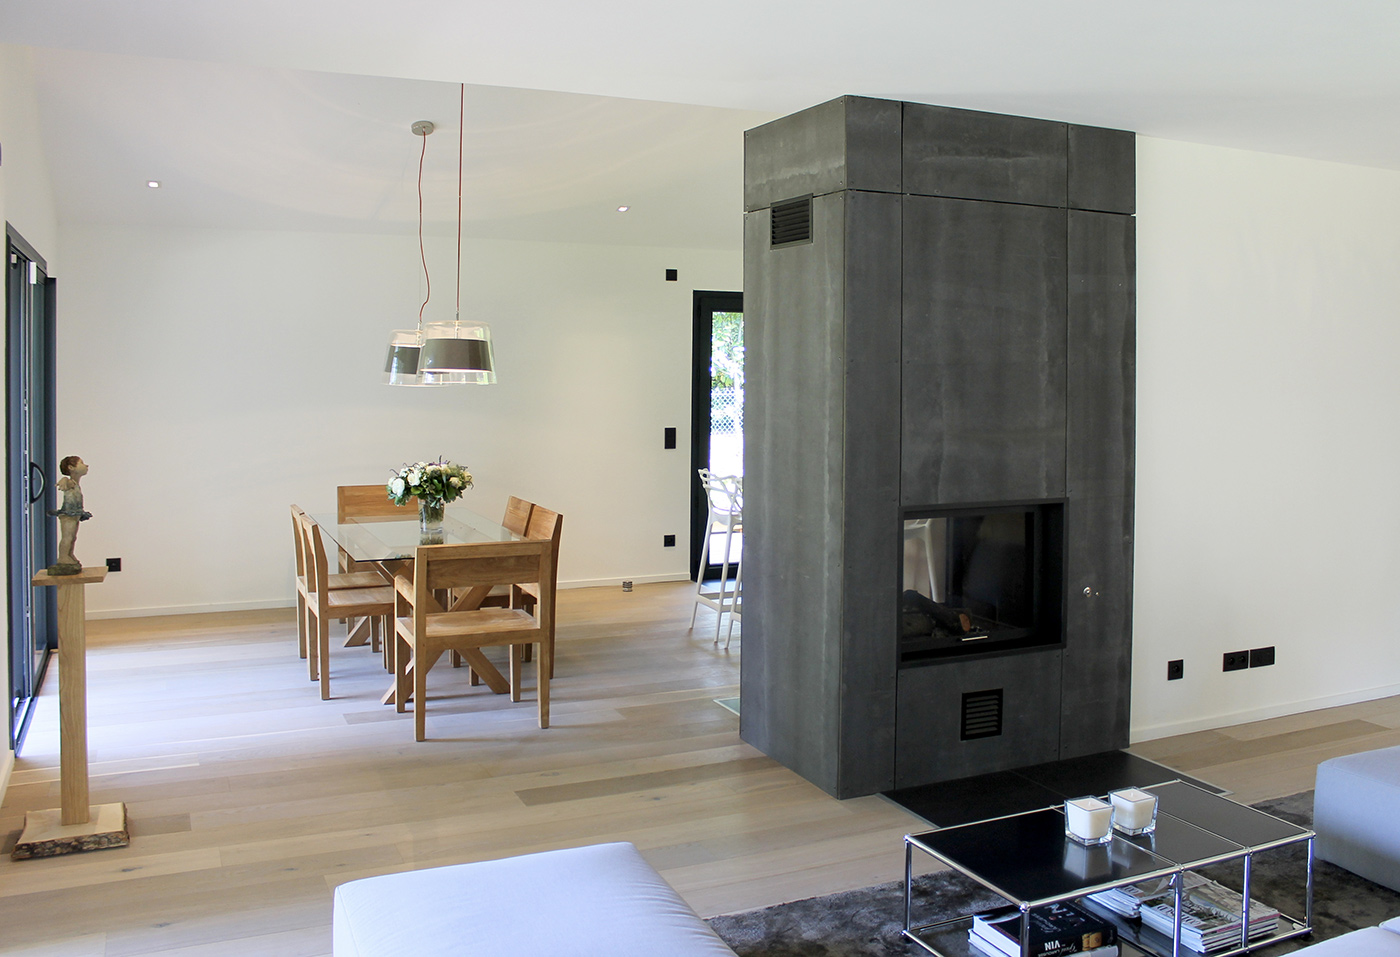 maison bois rhone with maison bois rhone fabulous maison bois en corse with maison bois rhone. Black Bedroom Furniture Sets. Home Design Ideas